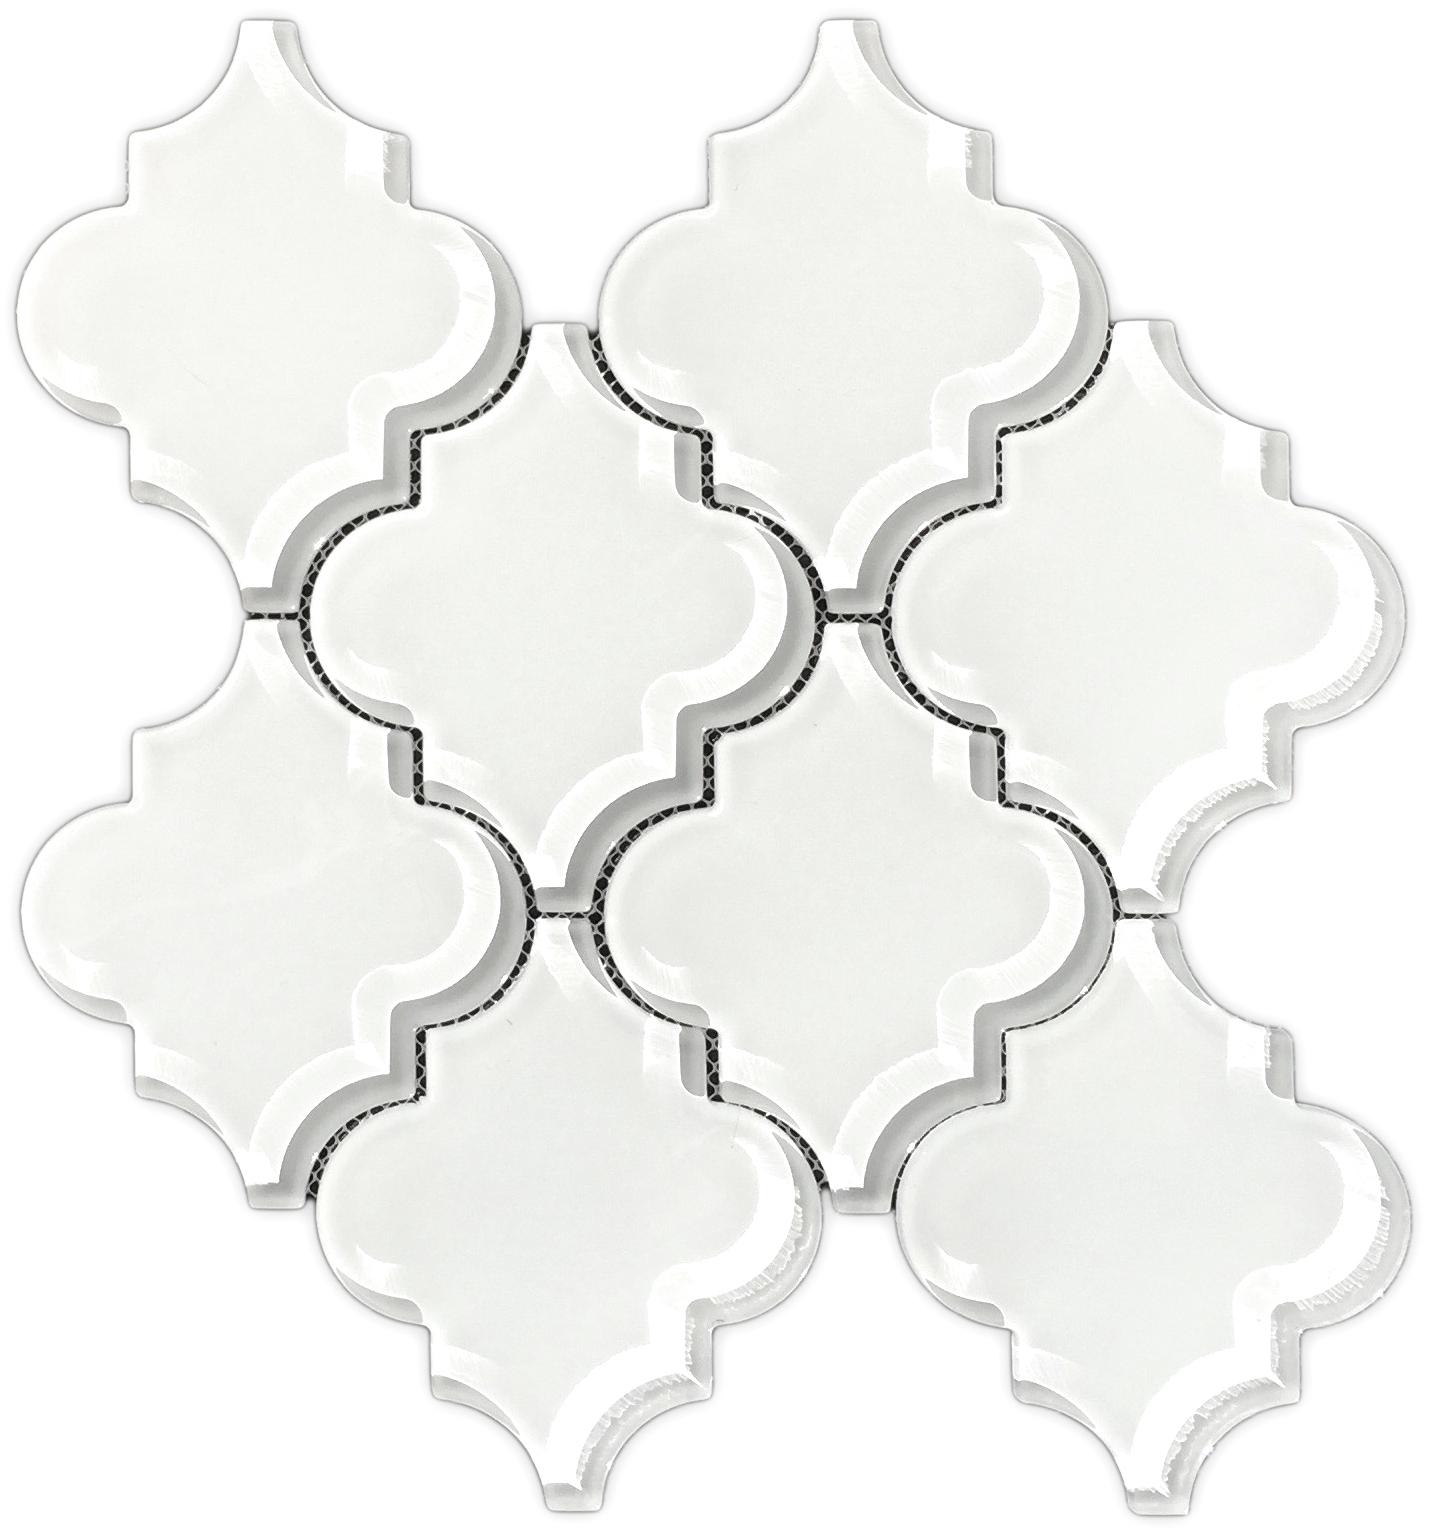 Brillaiant White Glass Arabesque Mosaic